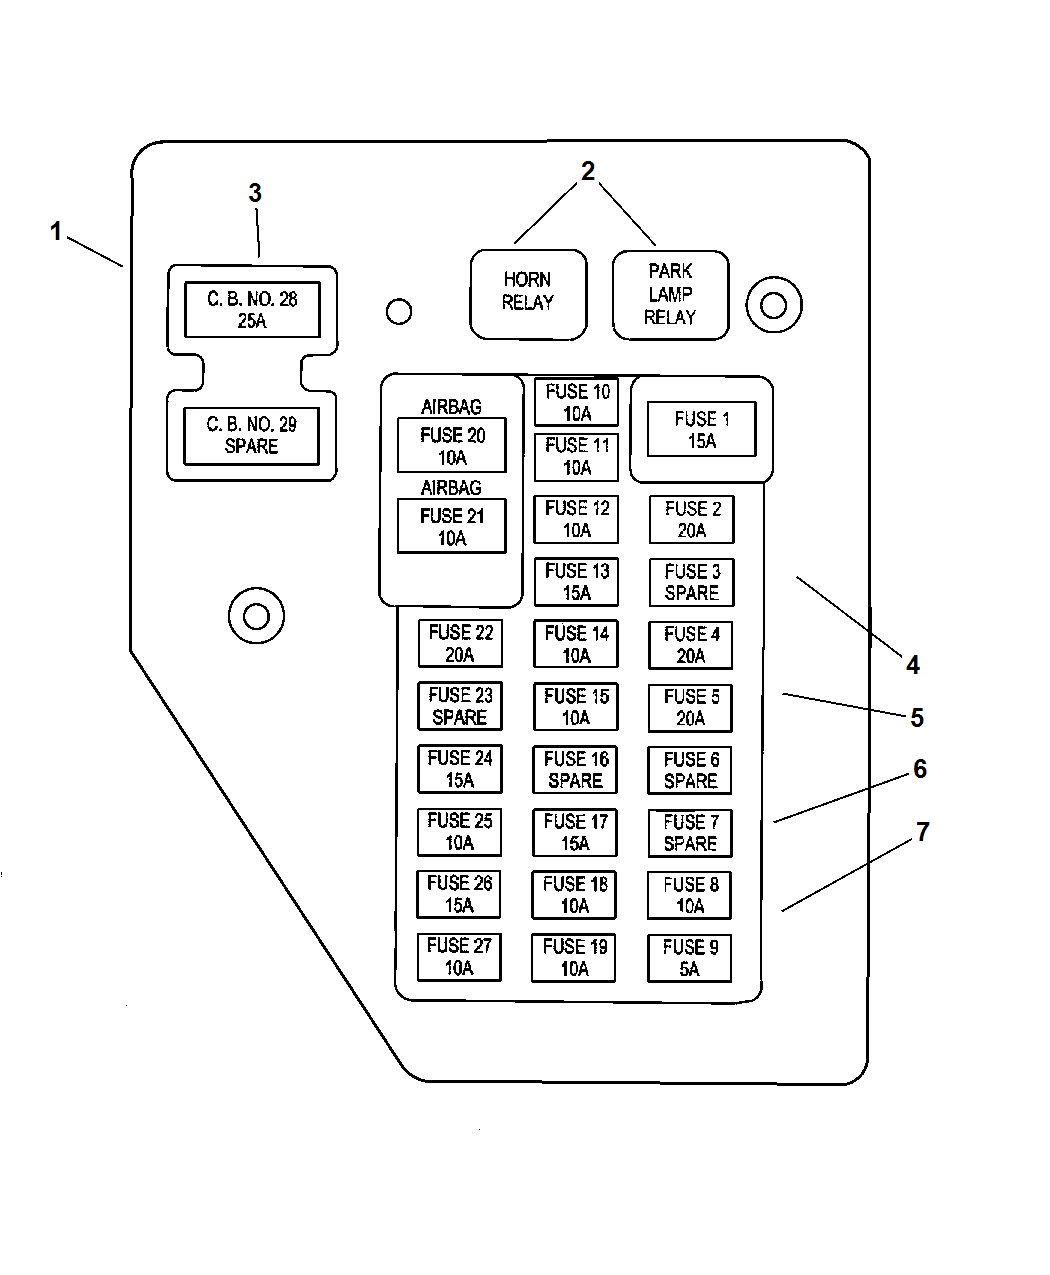 1994 dodge dakota fuse diagram - wiring diagram base central -  central.jabstudio.it  jab studio